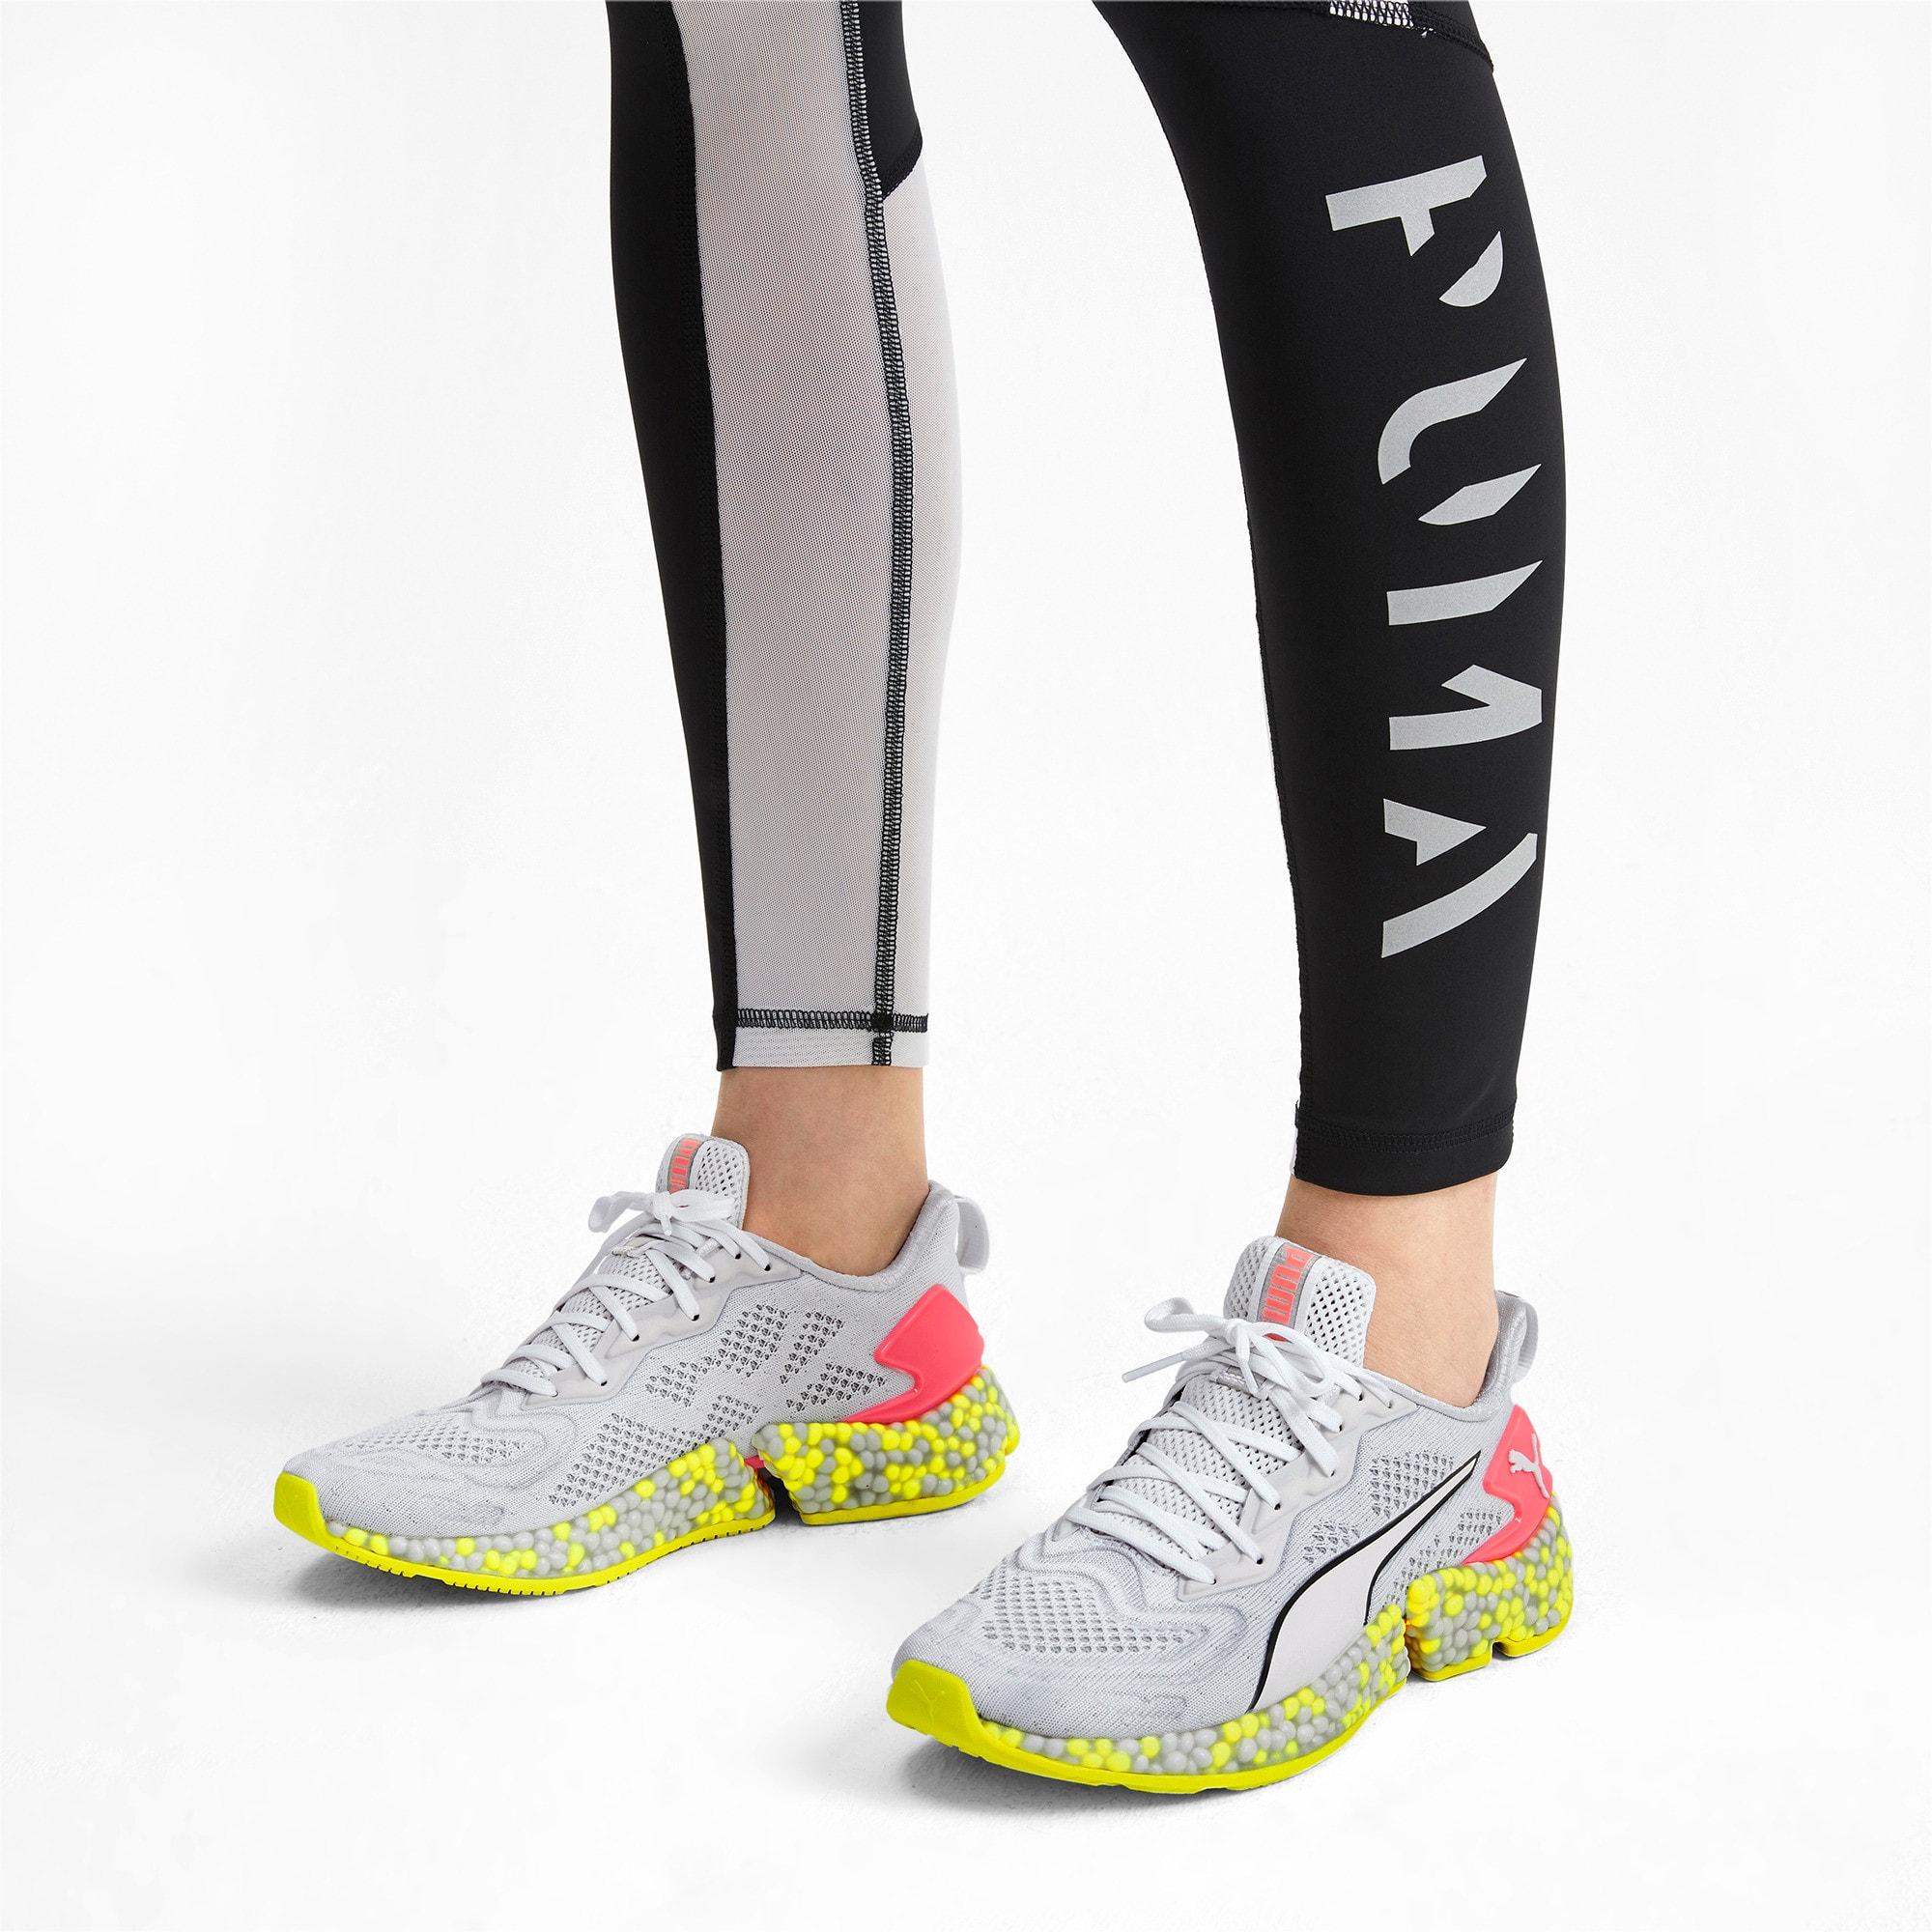 Miniatura 2 de Zapatos para correr SPEED Orbiter para mujer, Puma White-Yellow Alert, mediano